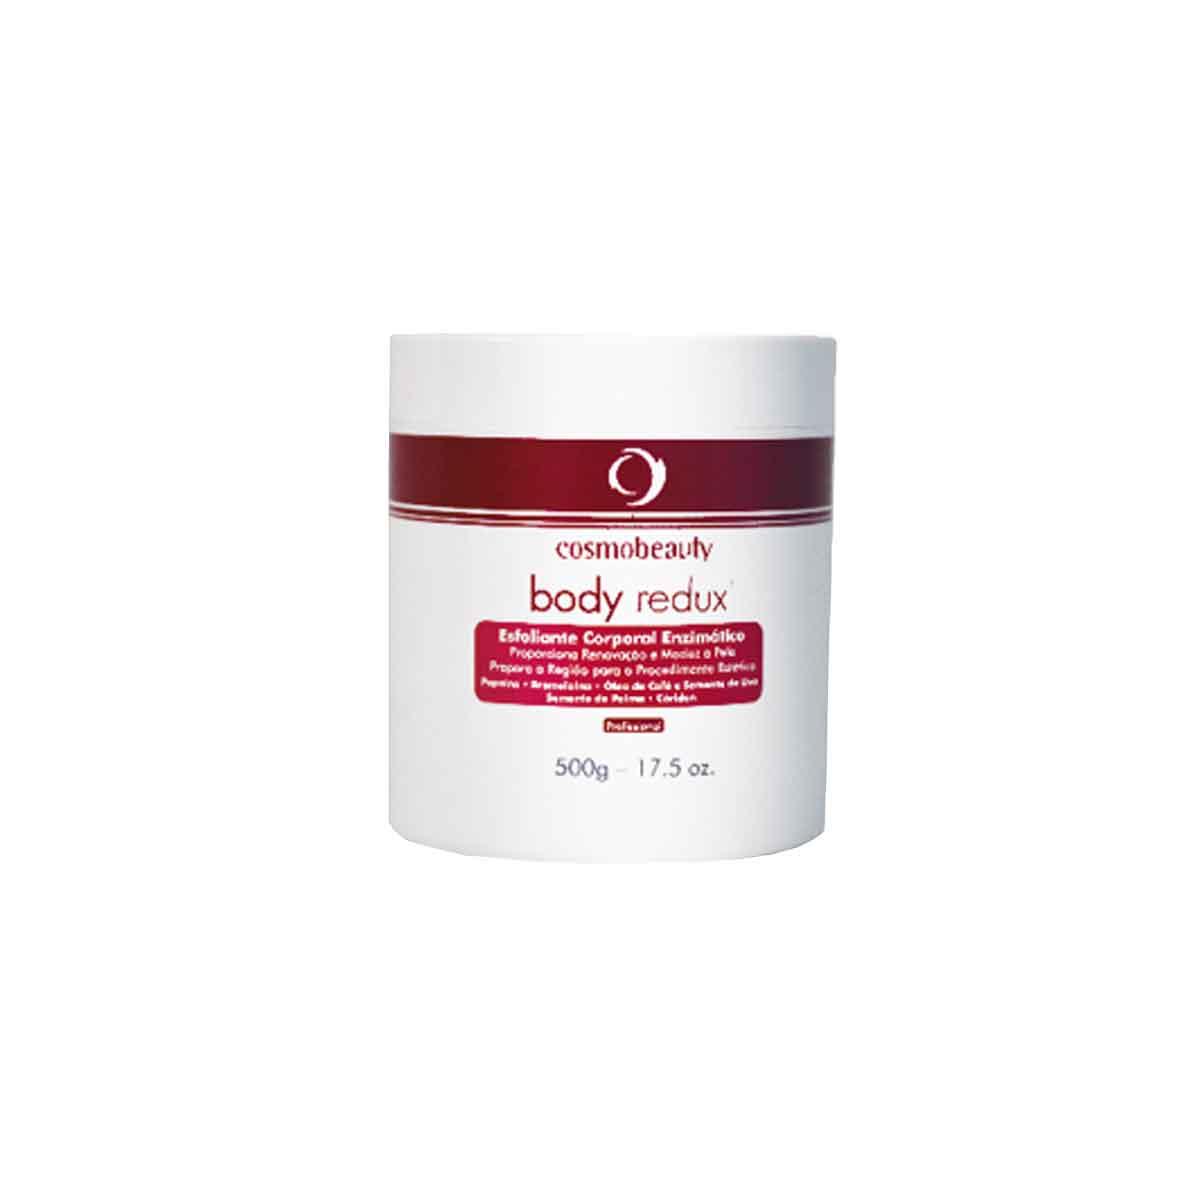 Esfoliante Corporal Enzimático Body Redux - 500g